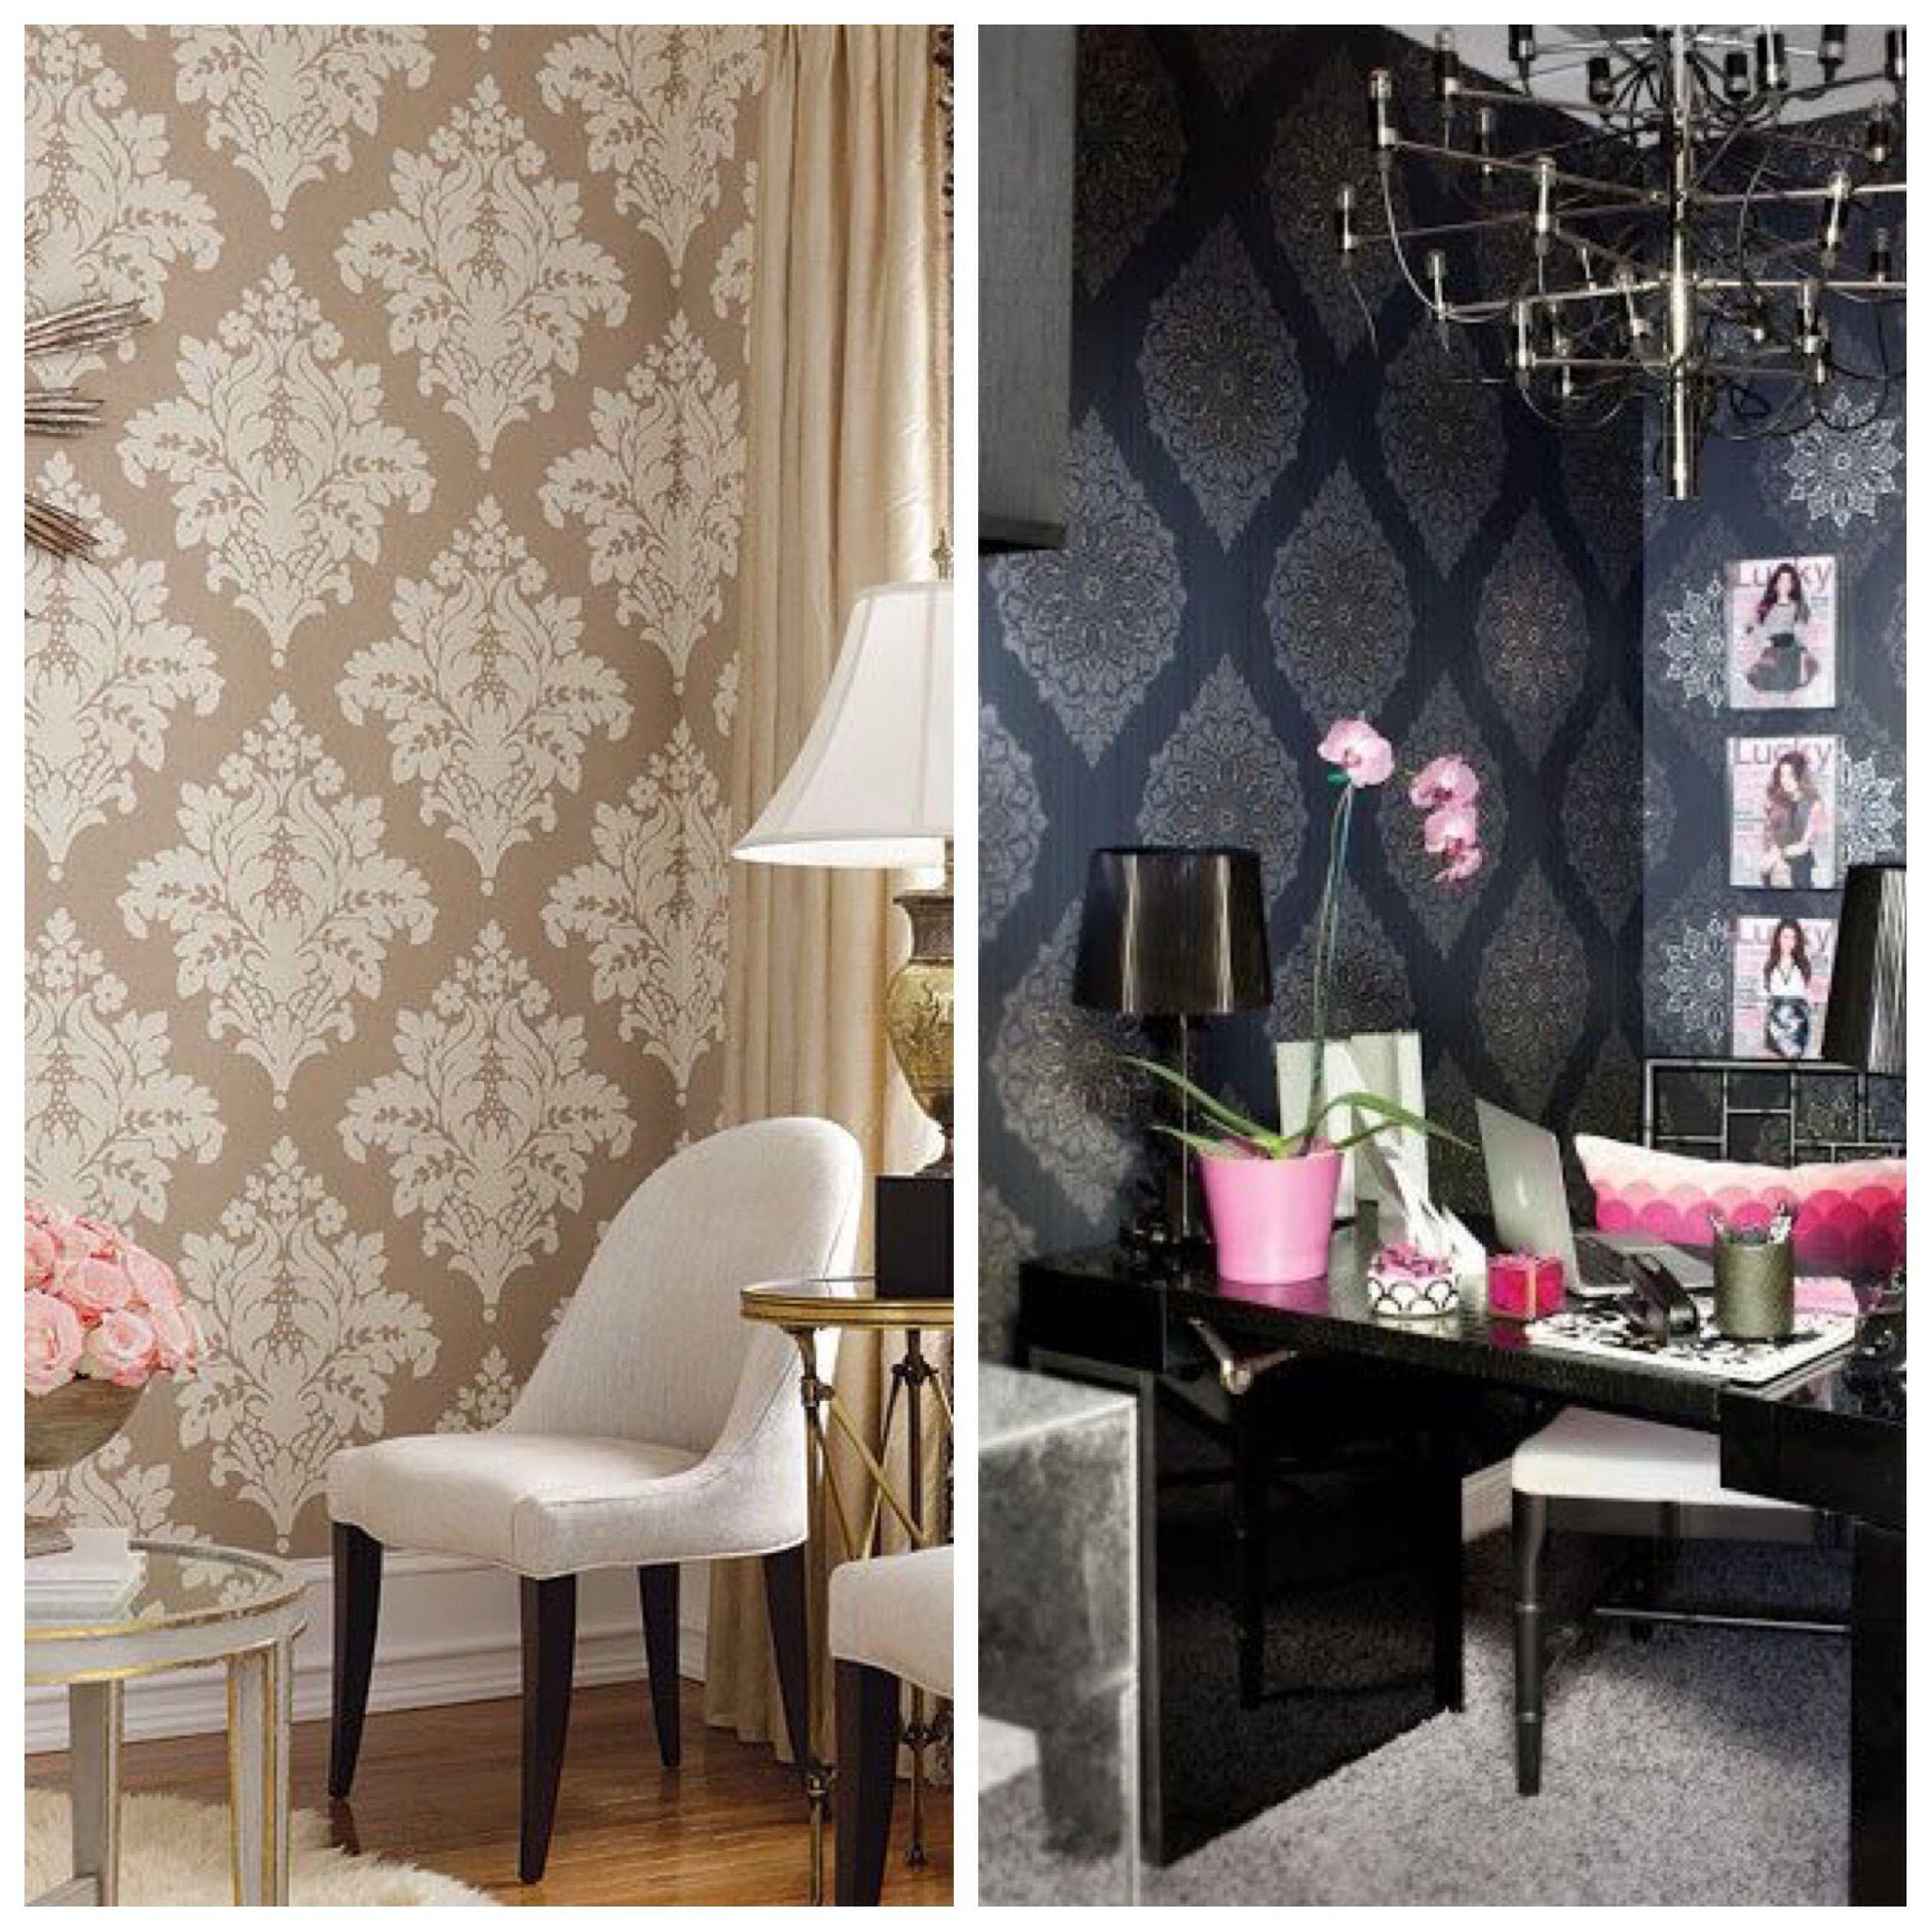 decorar con papel tapiz | HOGAR | Pinterest | Papel tapiz, Tapices y ...